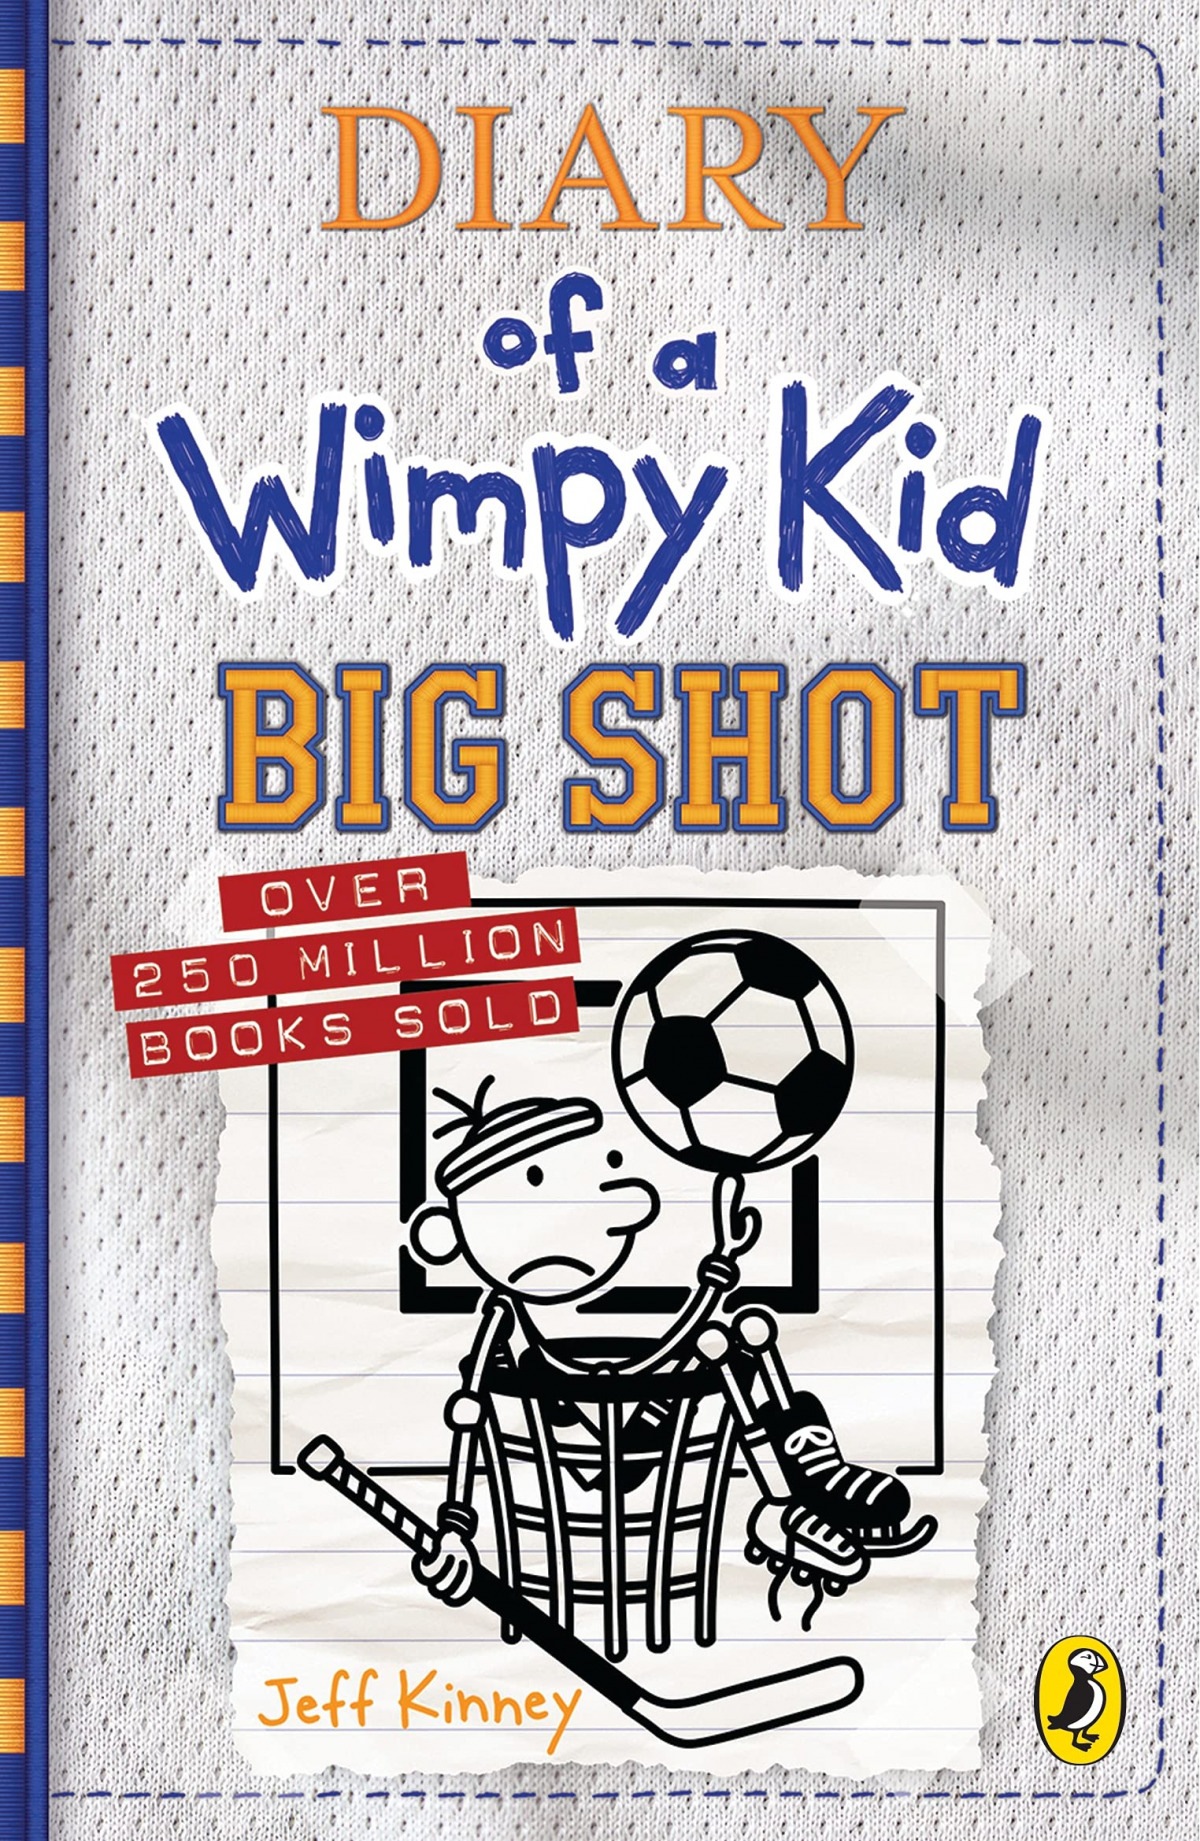 Big shot.diary o a wimpy kid (puffin uk)